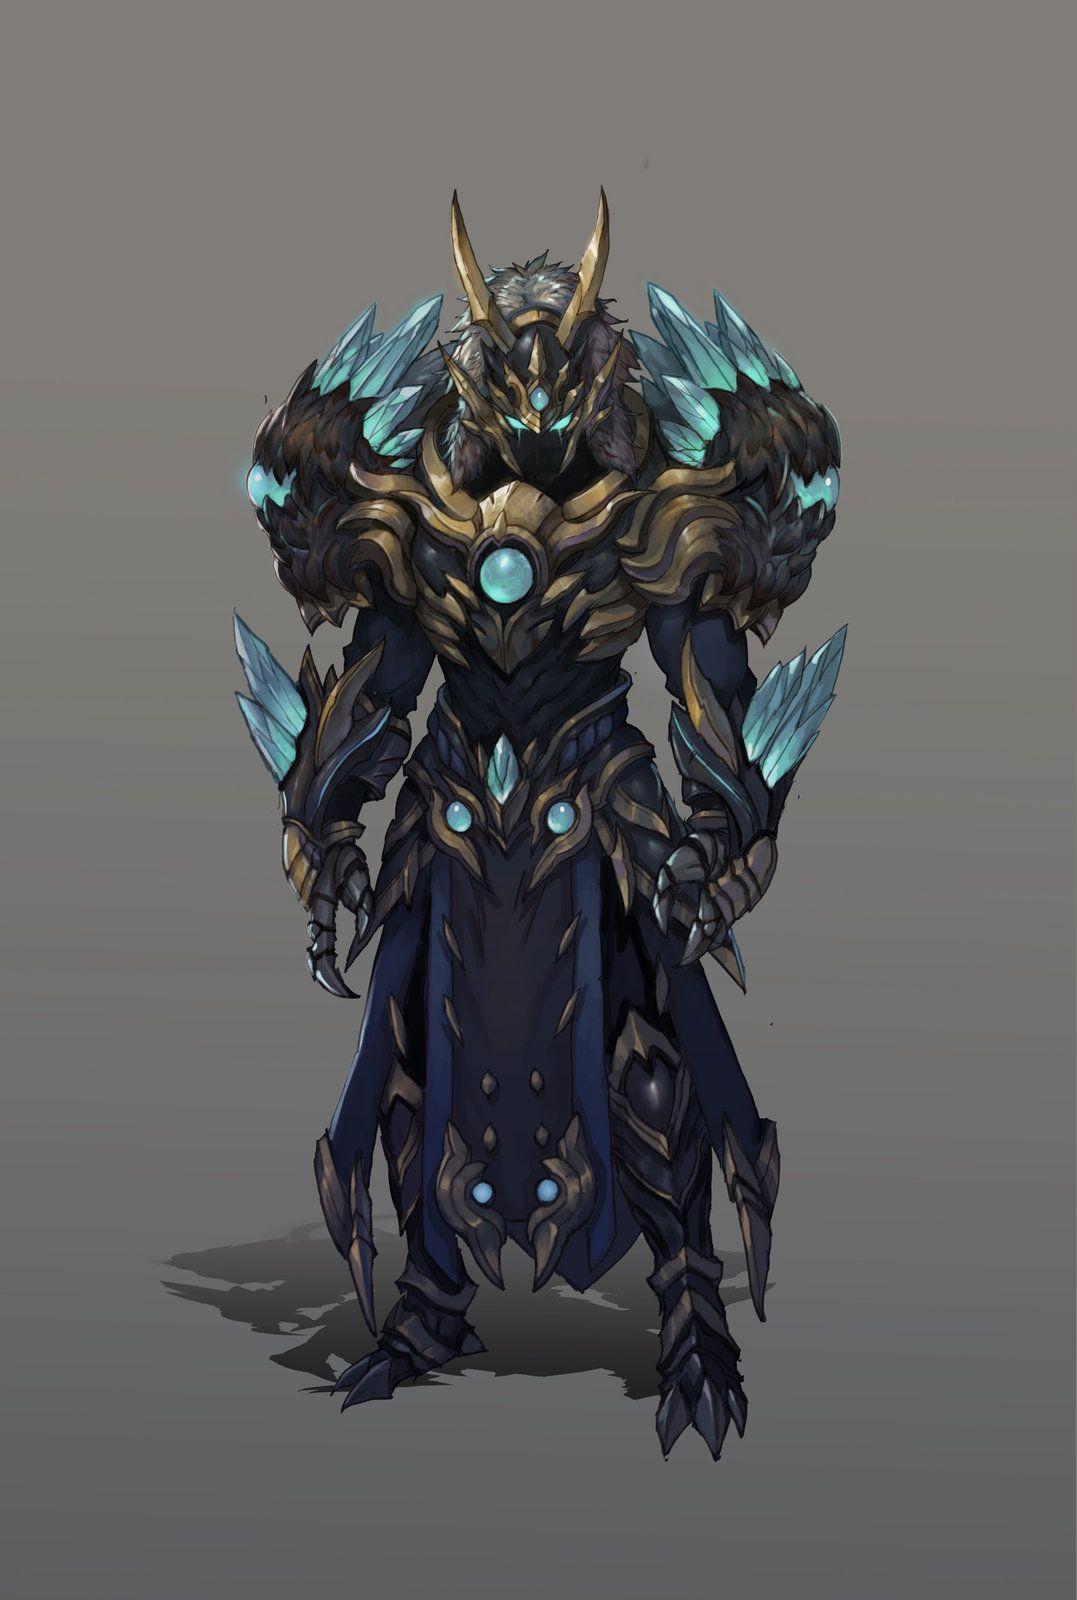 Pin On Concept Art Wolf knight #fantasy #fantasyart #armor #conceptart #characterdesign #character #knight. pin on concept art